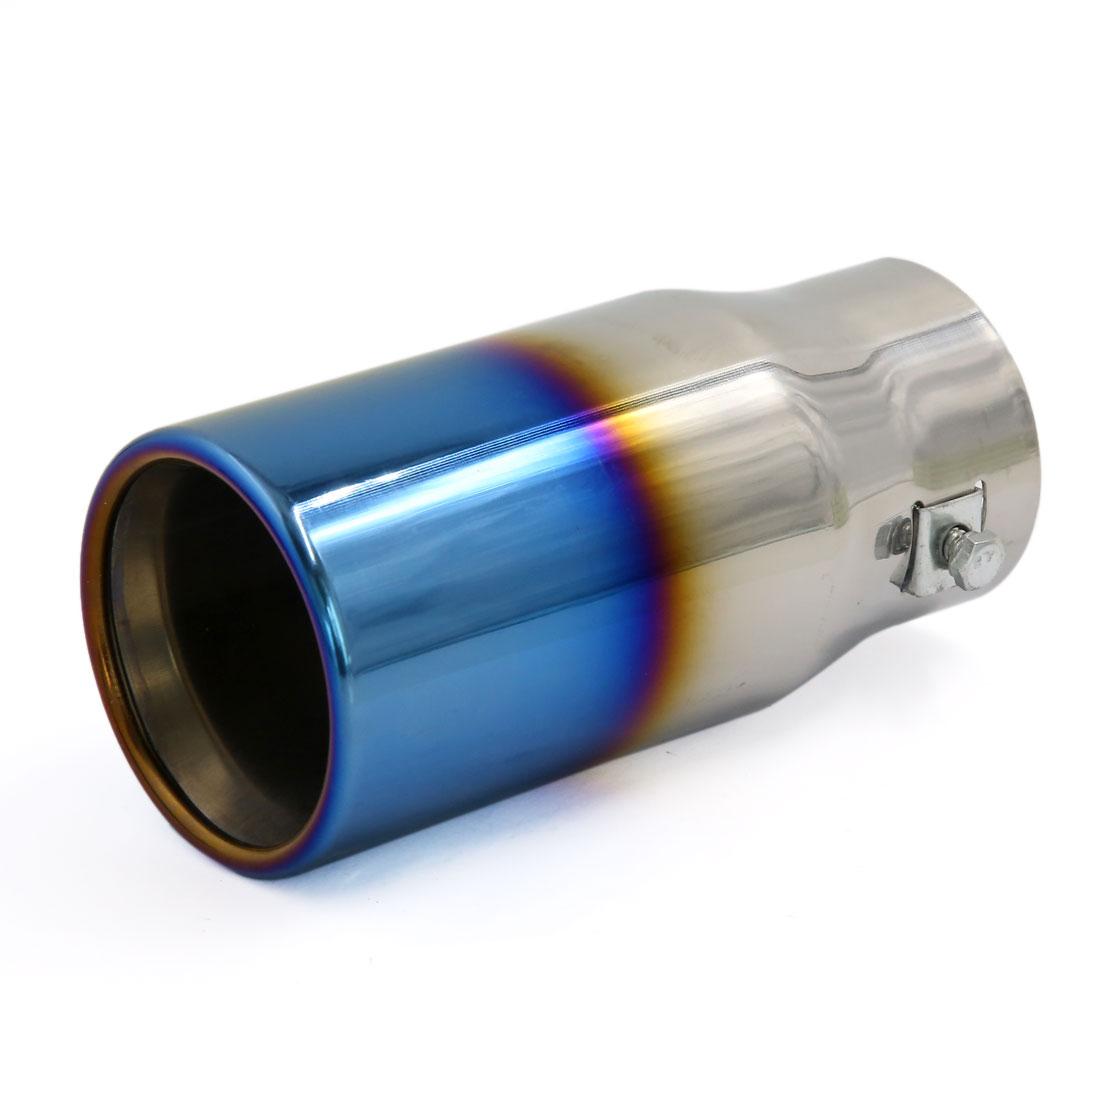 Titanium Blue Modified Exhaust Muffler Tip Silencer for Vehicle Car